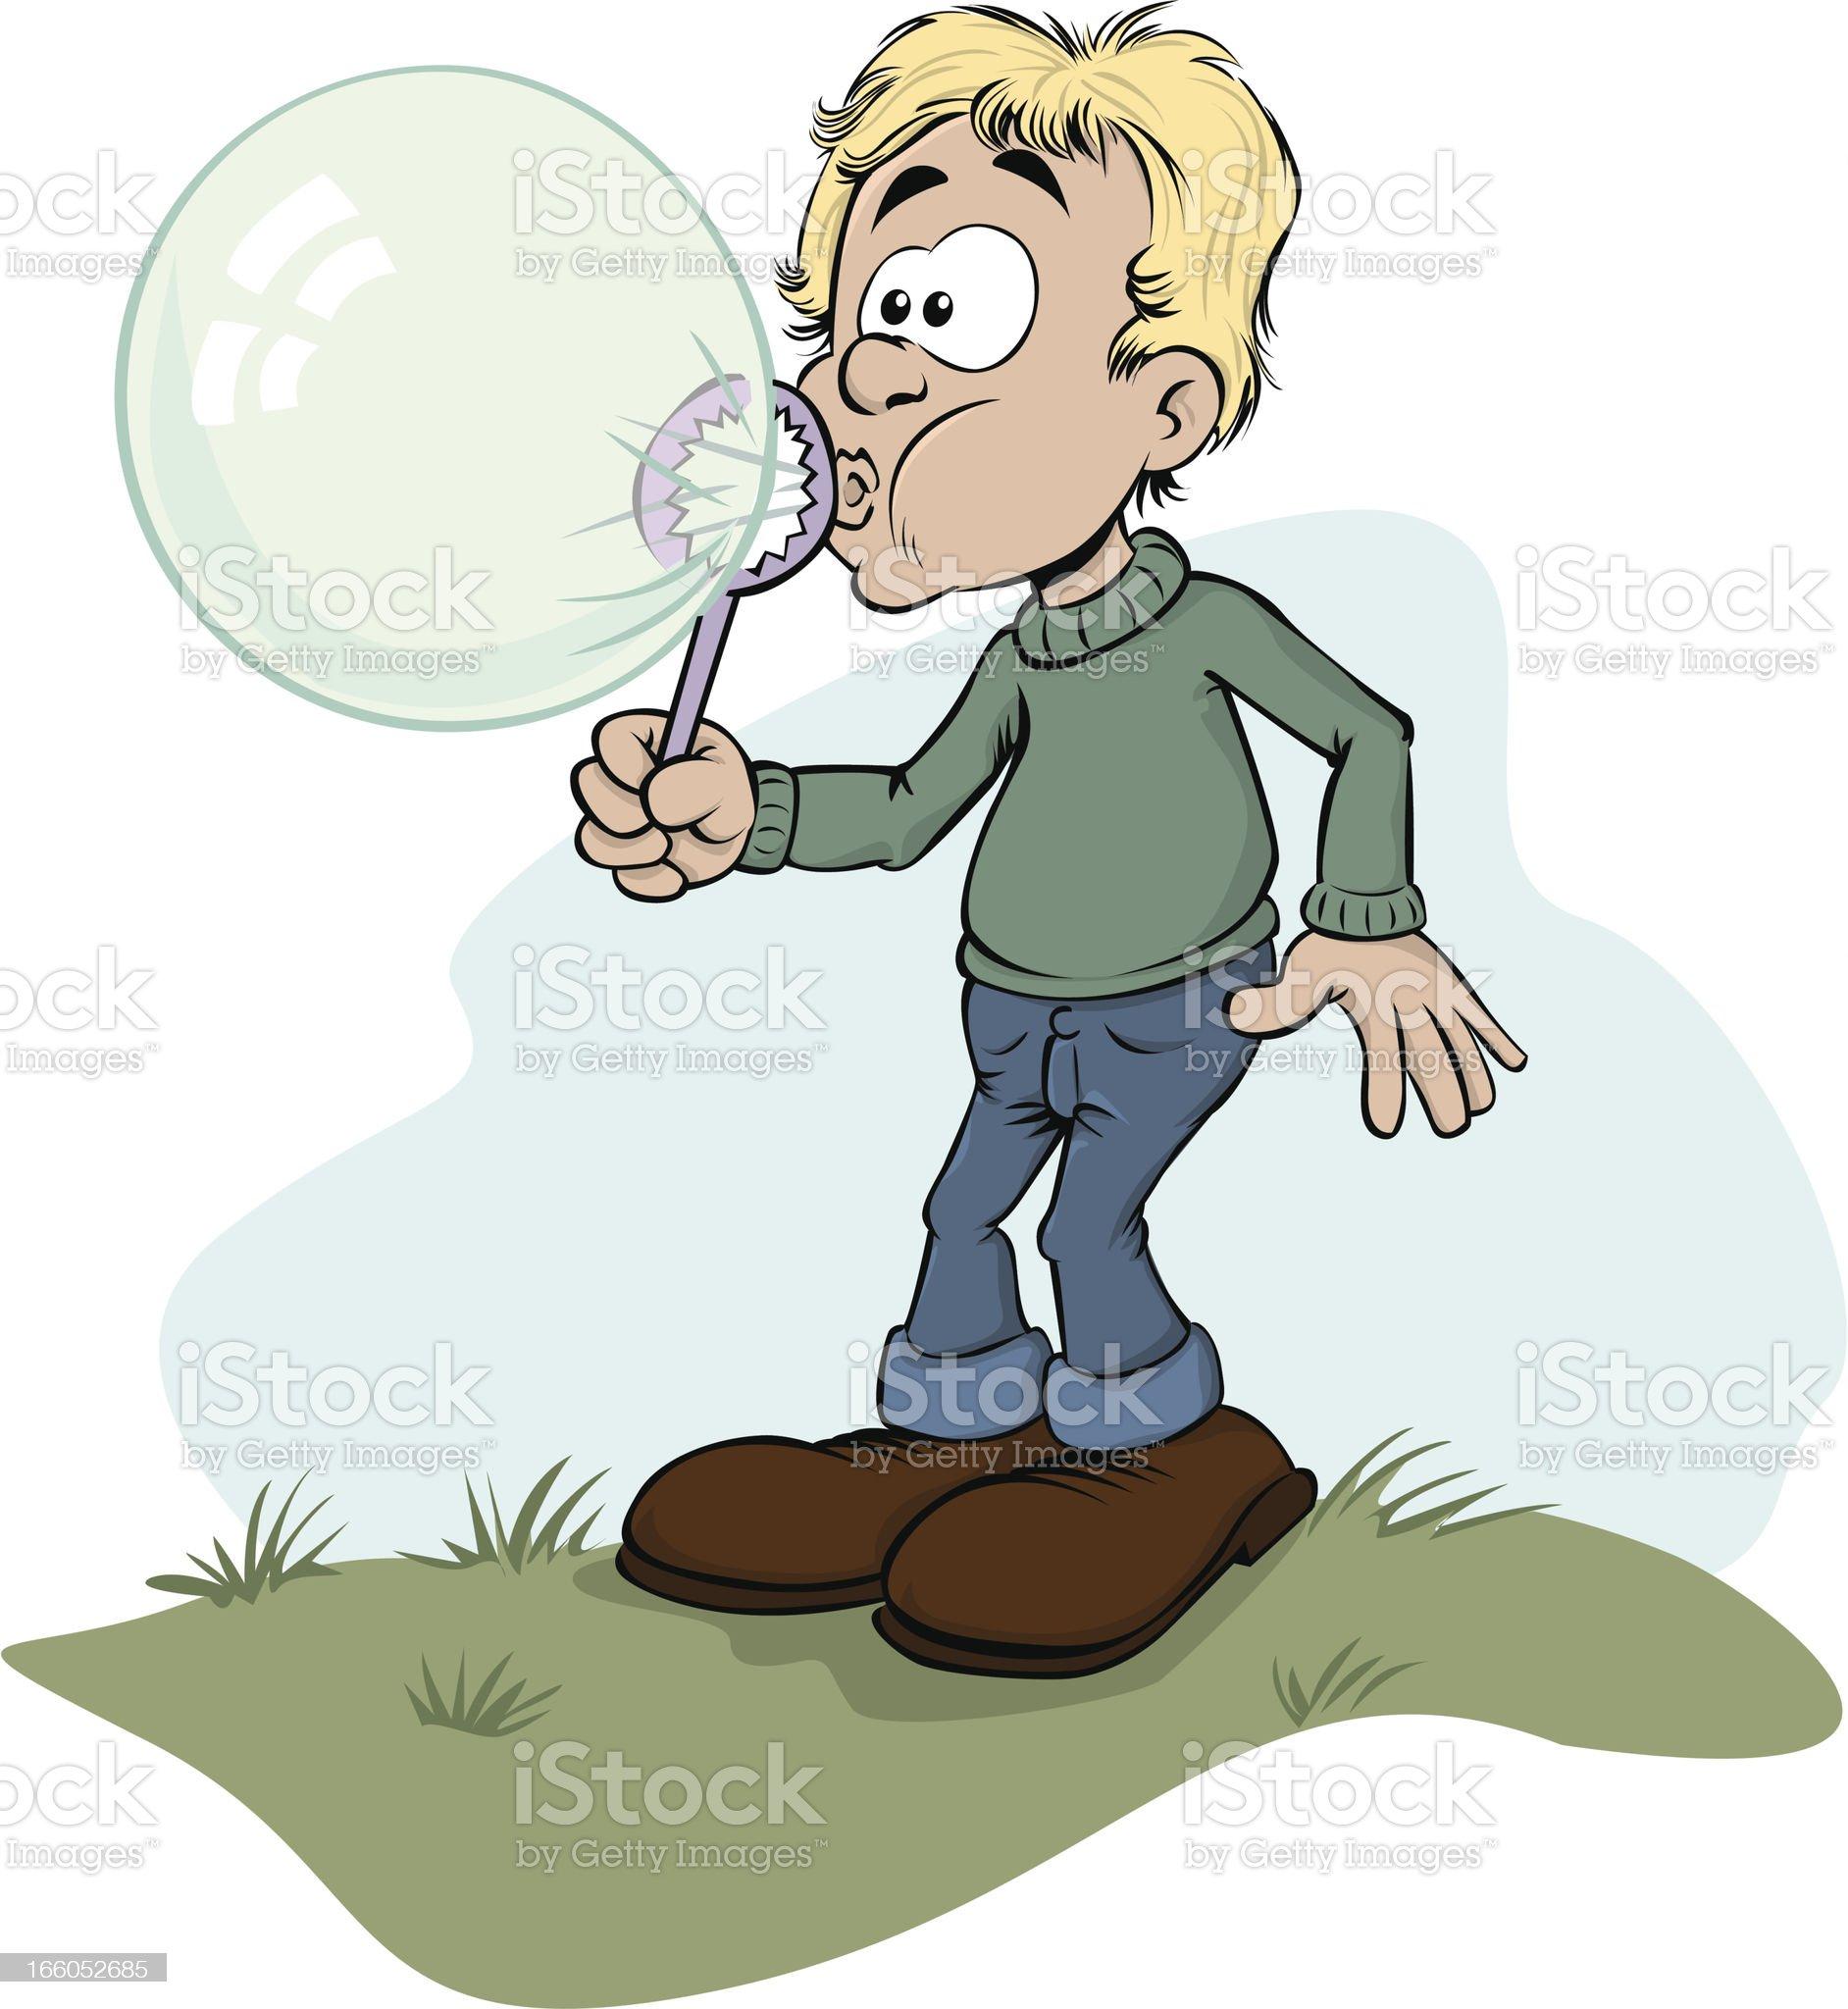 Boy makes a bubble. royalty-free stock vector art